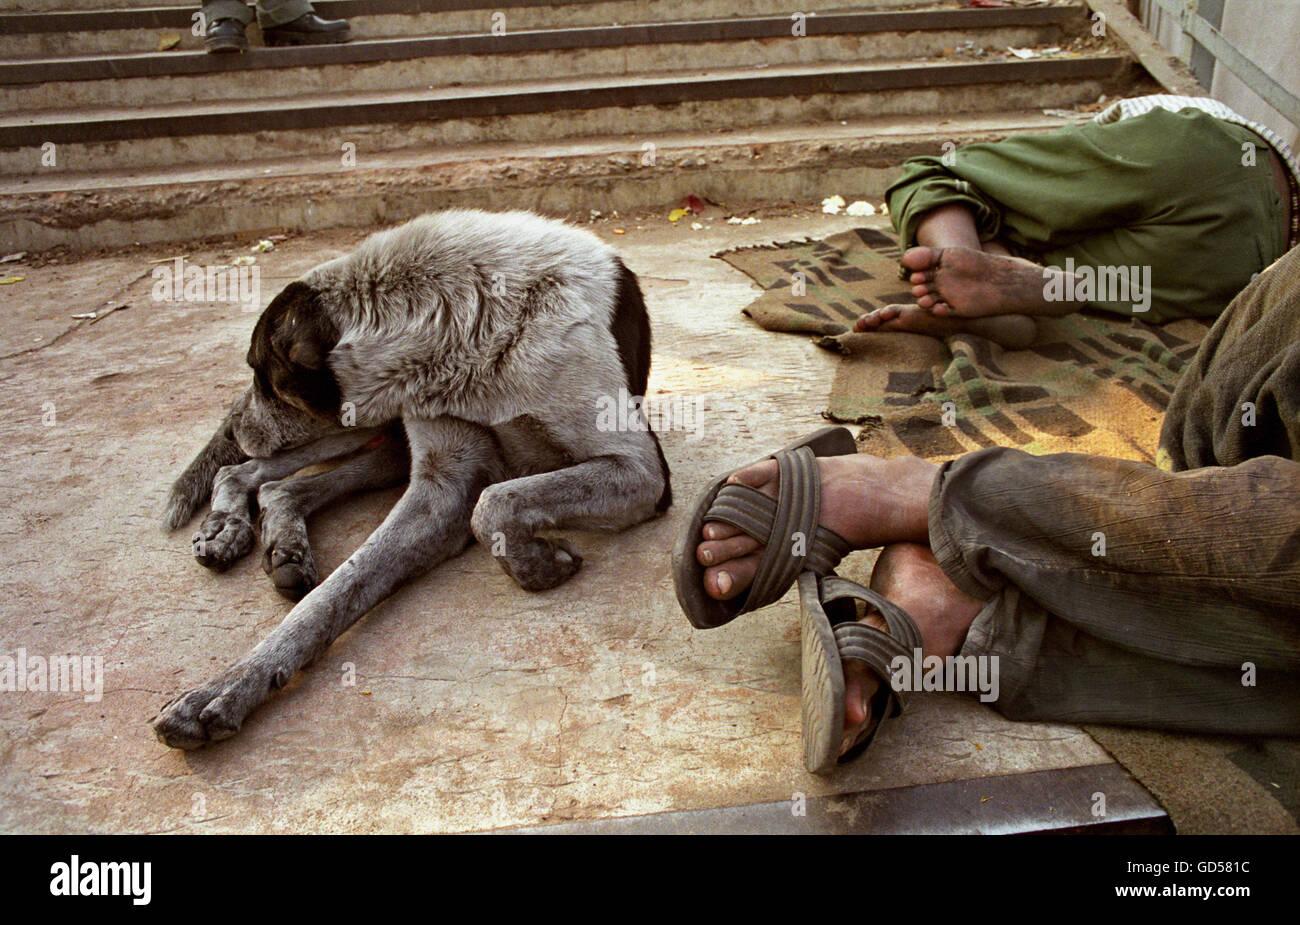 Dog sleeping besides men - Stock Image